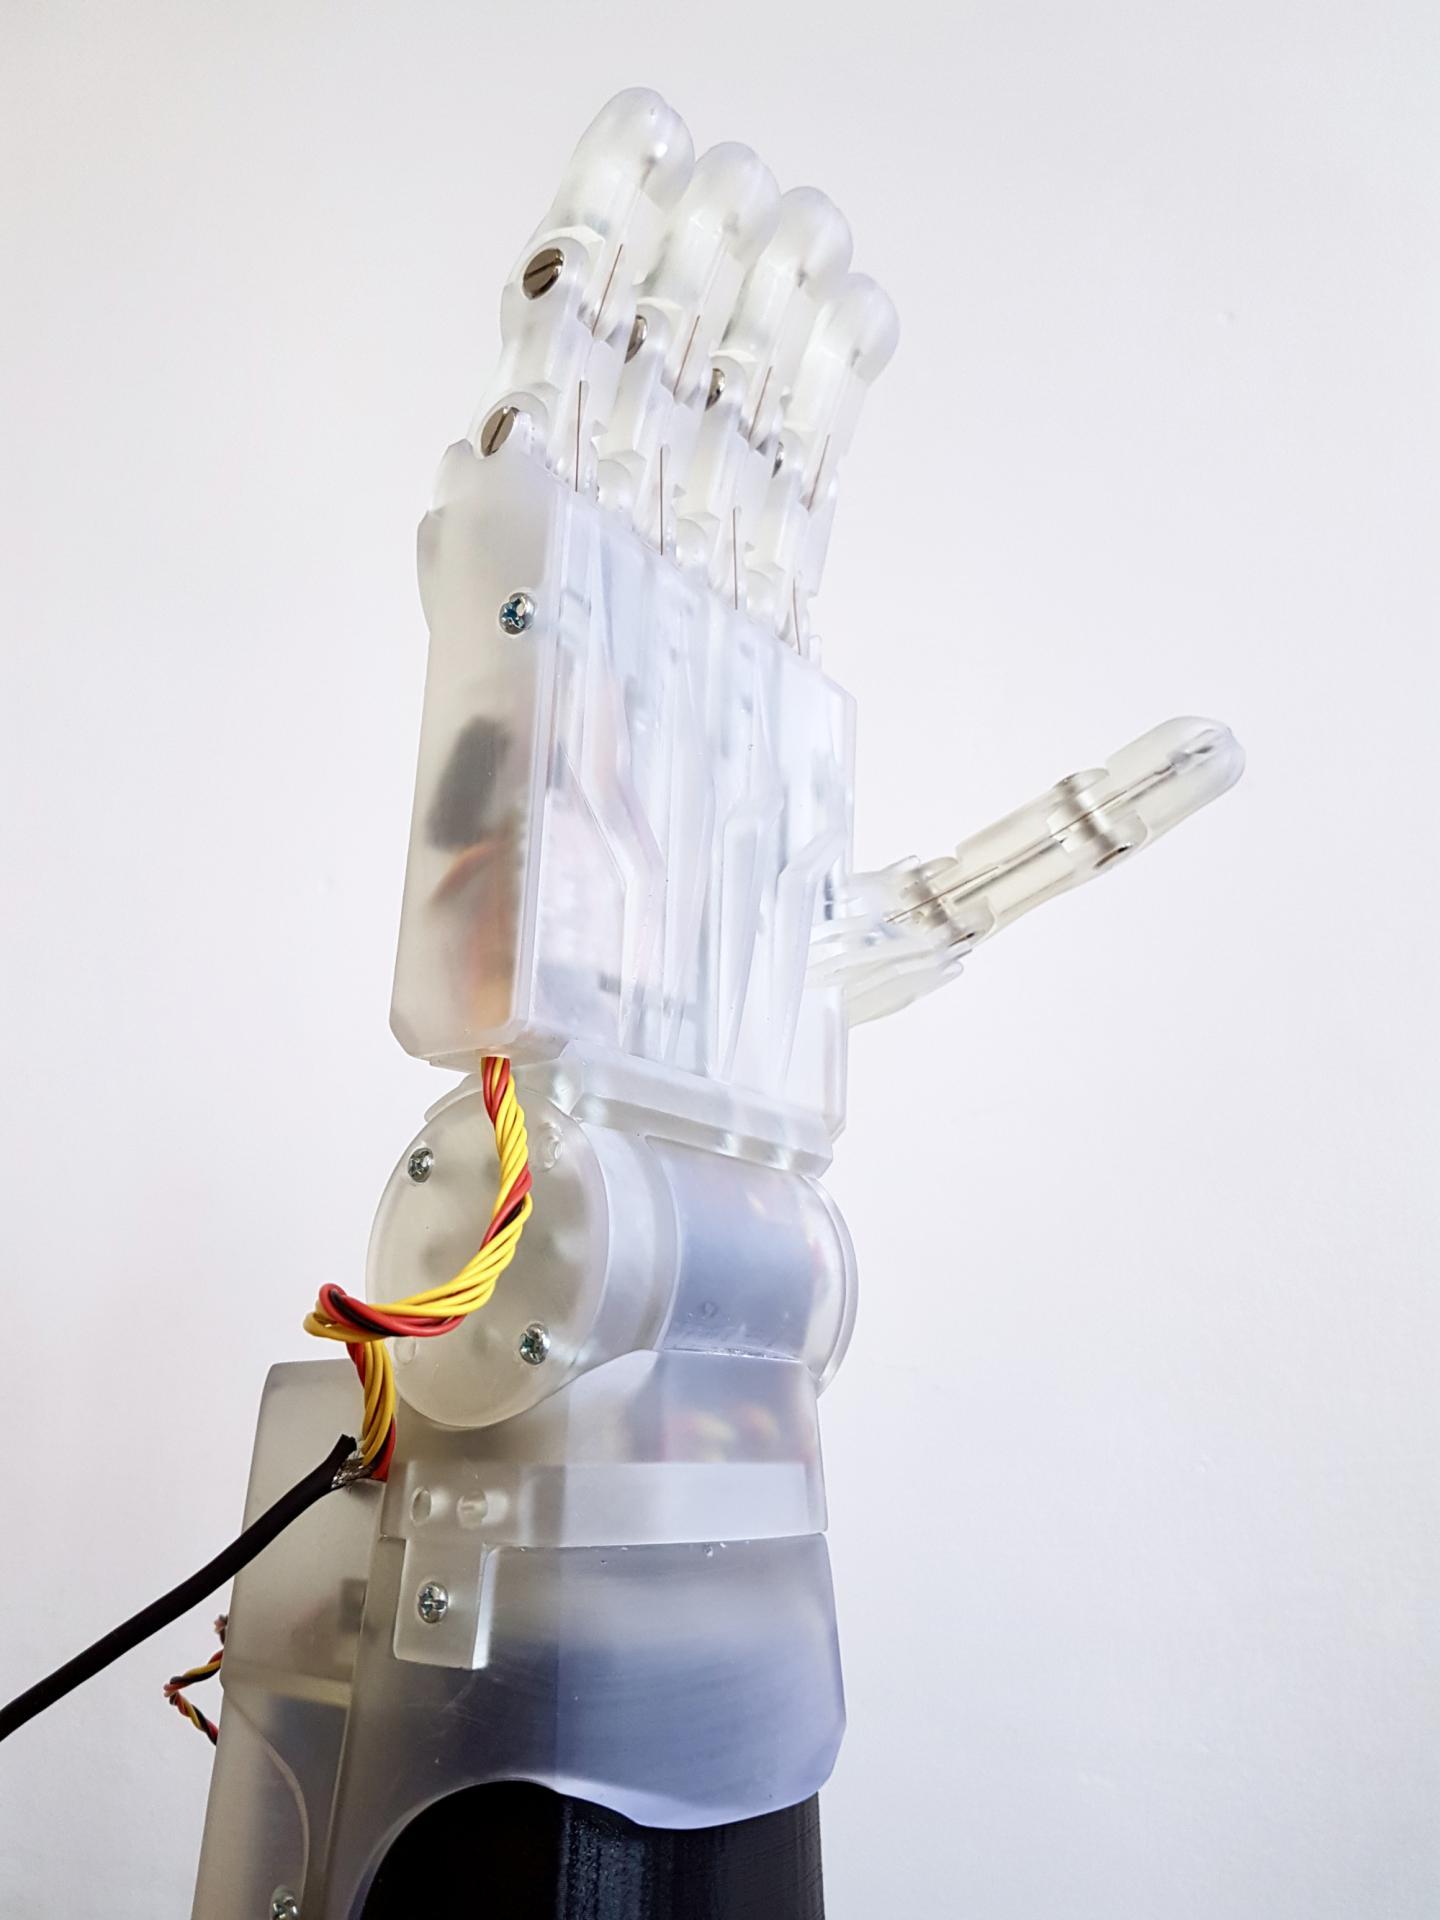 LASO Robot Hand